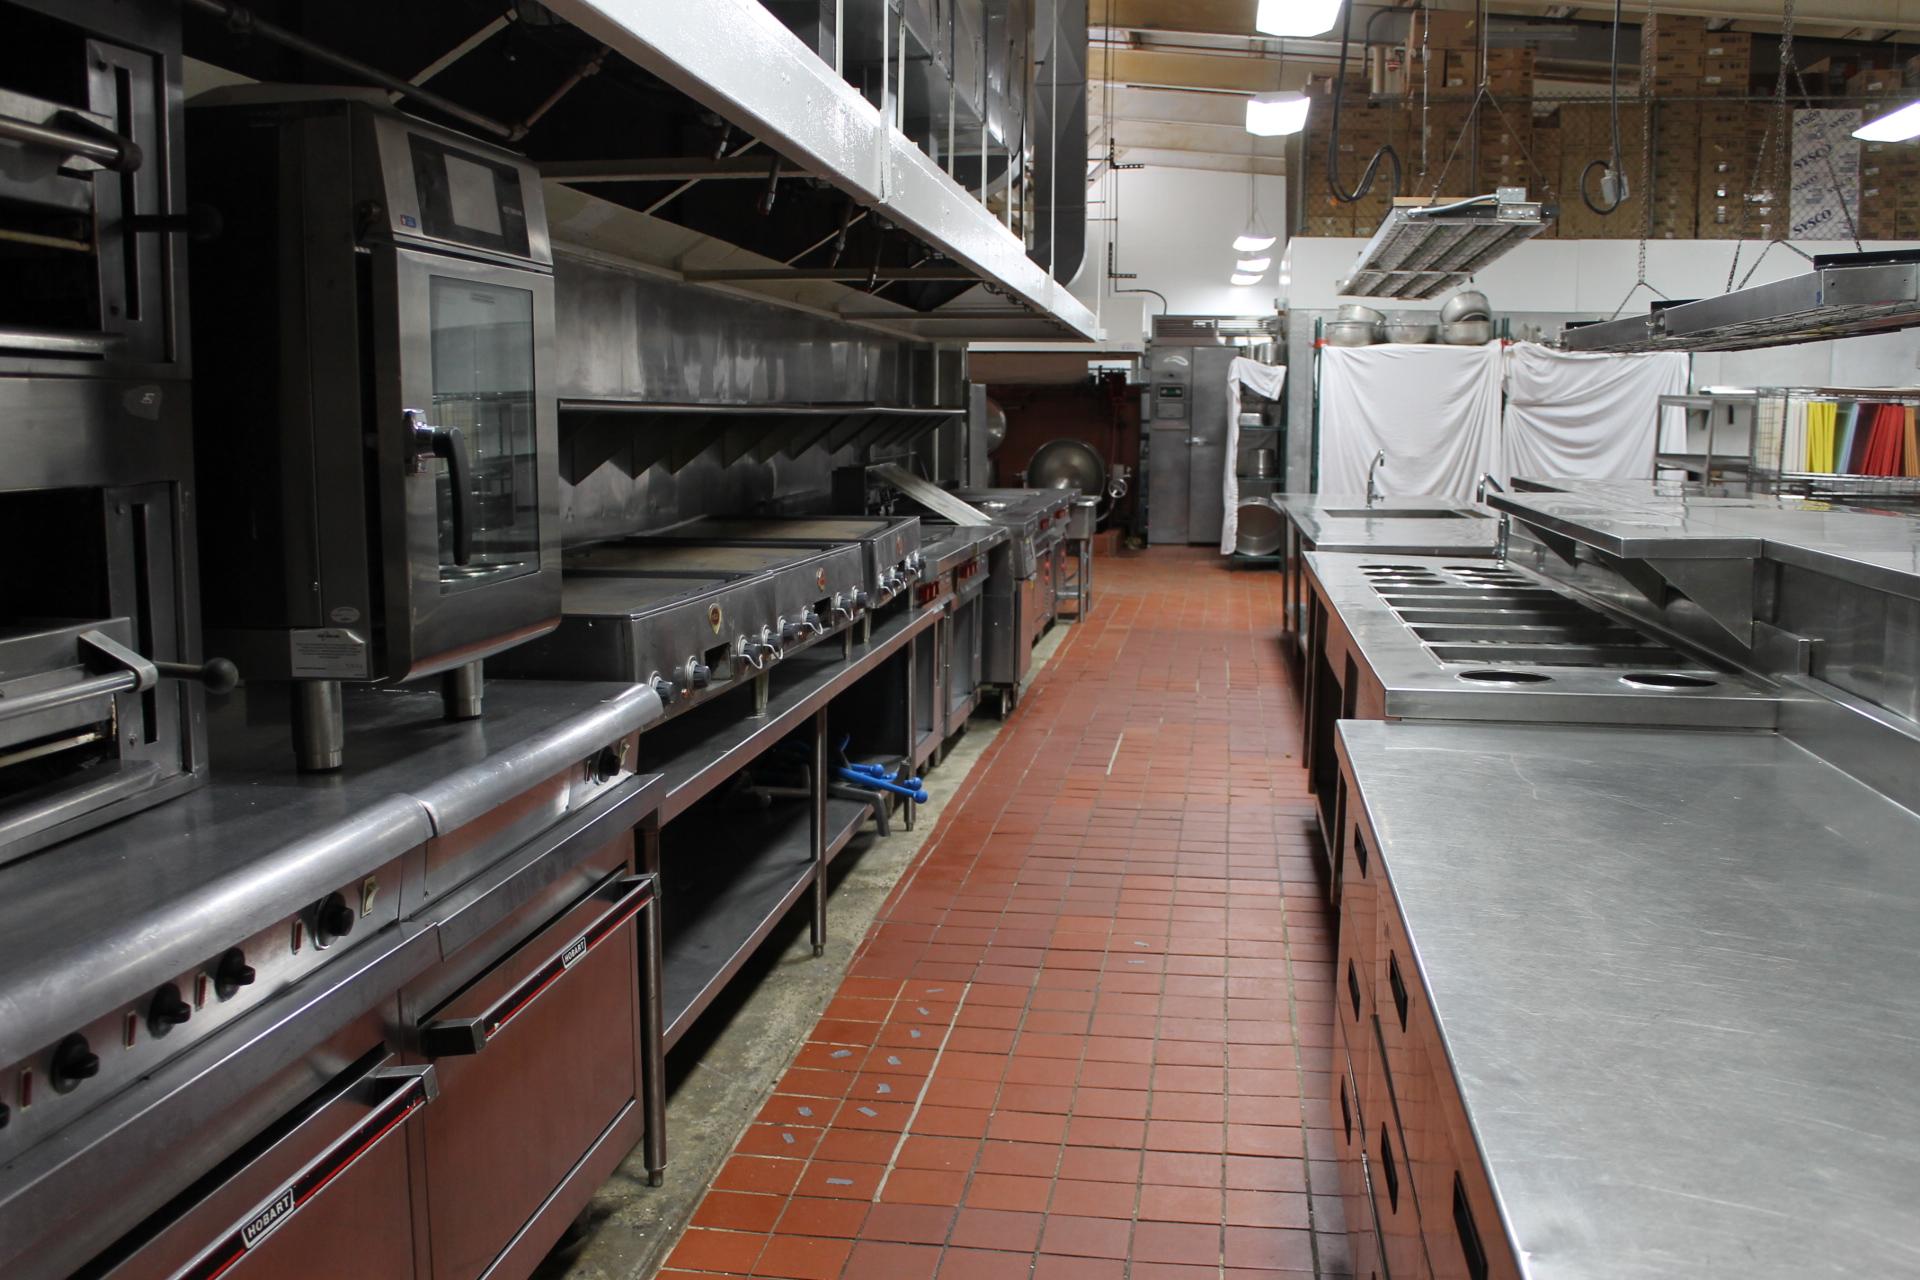 The grand hotel kitchen is massive